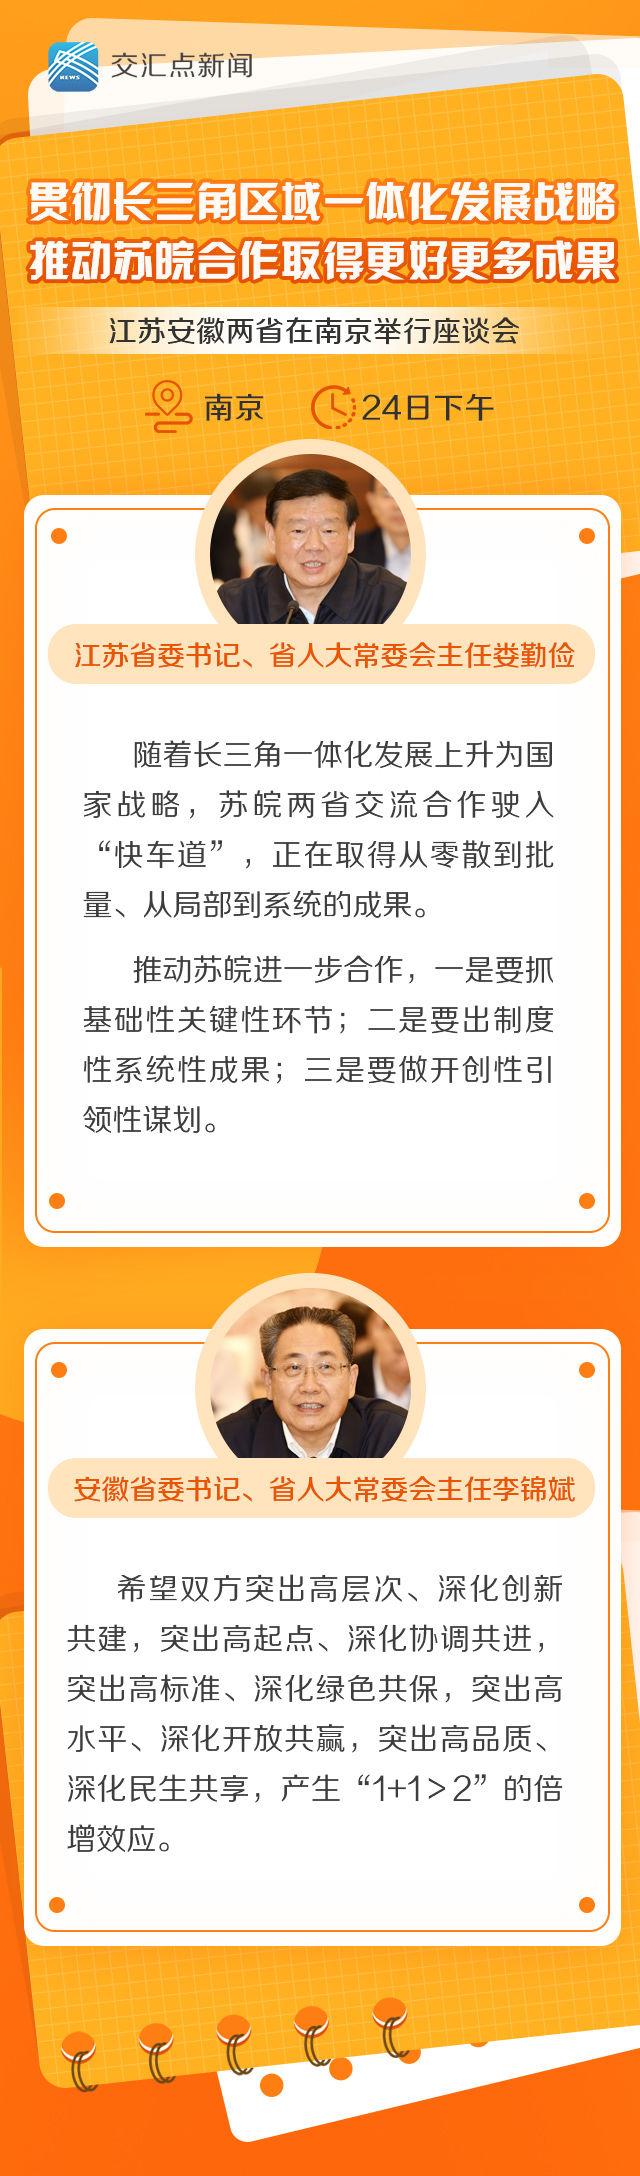 http://www.nthuaimage.com/nantongjingji/29473.html